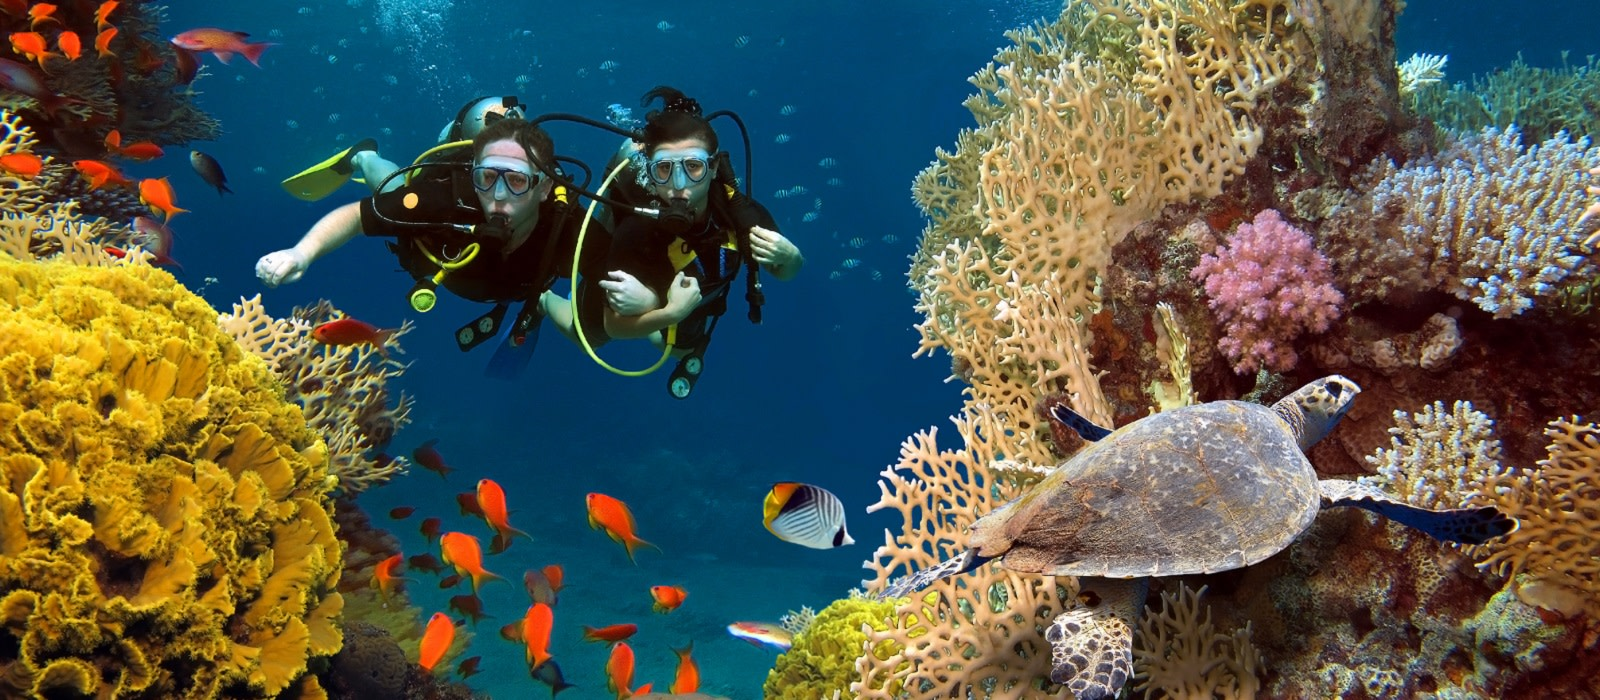 Maldives Scuba Diving Activity